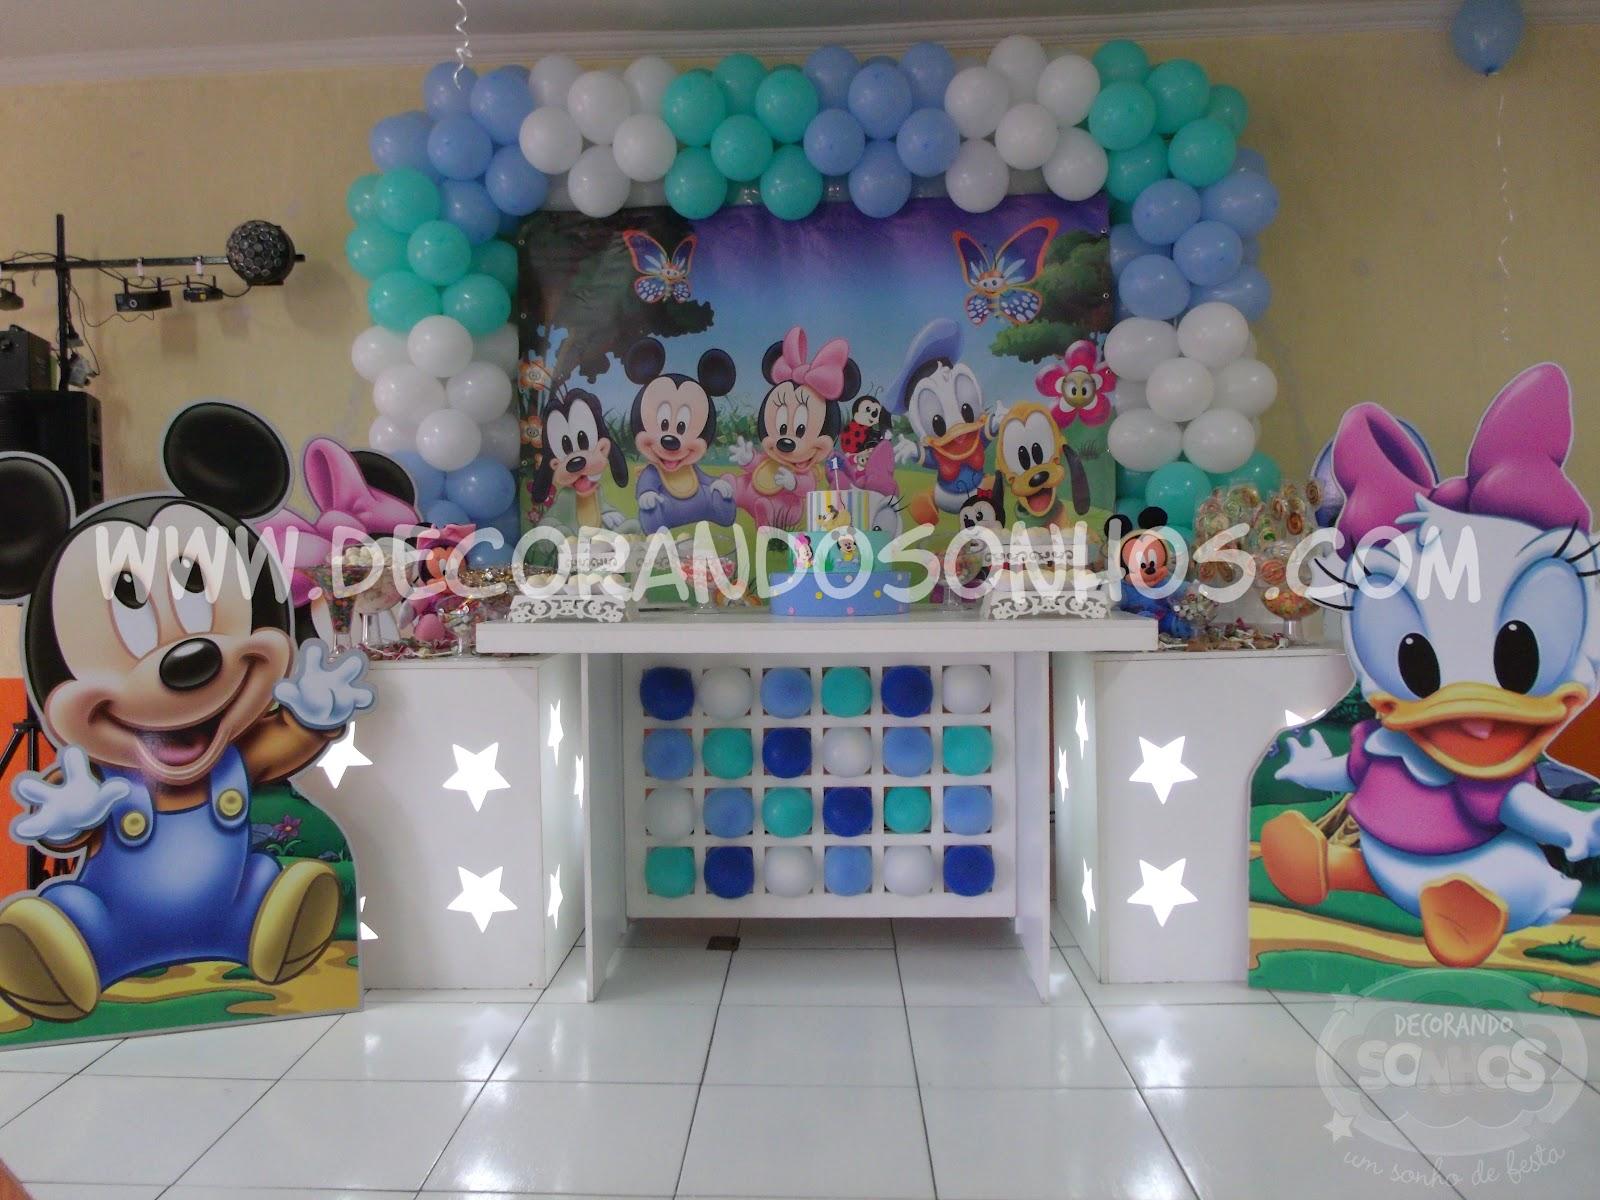 http://1.bp.blogspot.com/-2s2iiH5Wq9w/T9YFdu_4HvI/AAAAAAAAA4A/hKdSBqJMdpY/s1600/decoracao+festa+clean+infantil+decoracao+Infantil+Baby+Disney+decoracao+clean+disney+baby+festa+infantil+clean+decora%25C3%25A7%25C3%25A3o+clean+disney+bab583.JPG